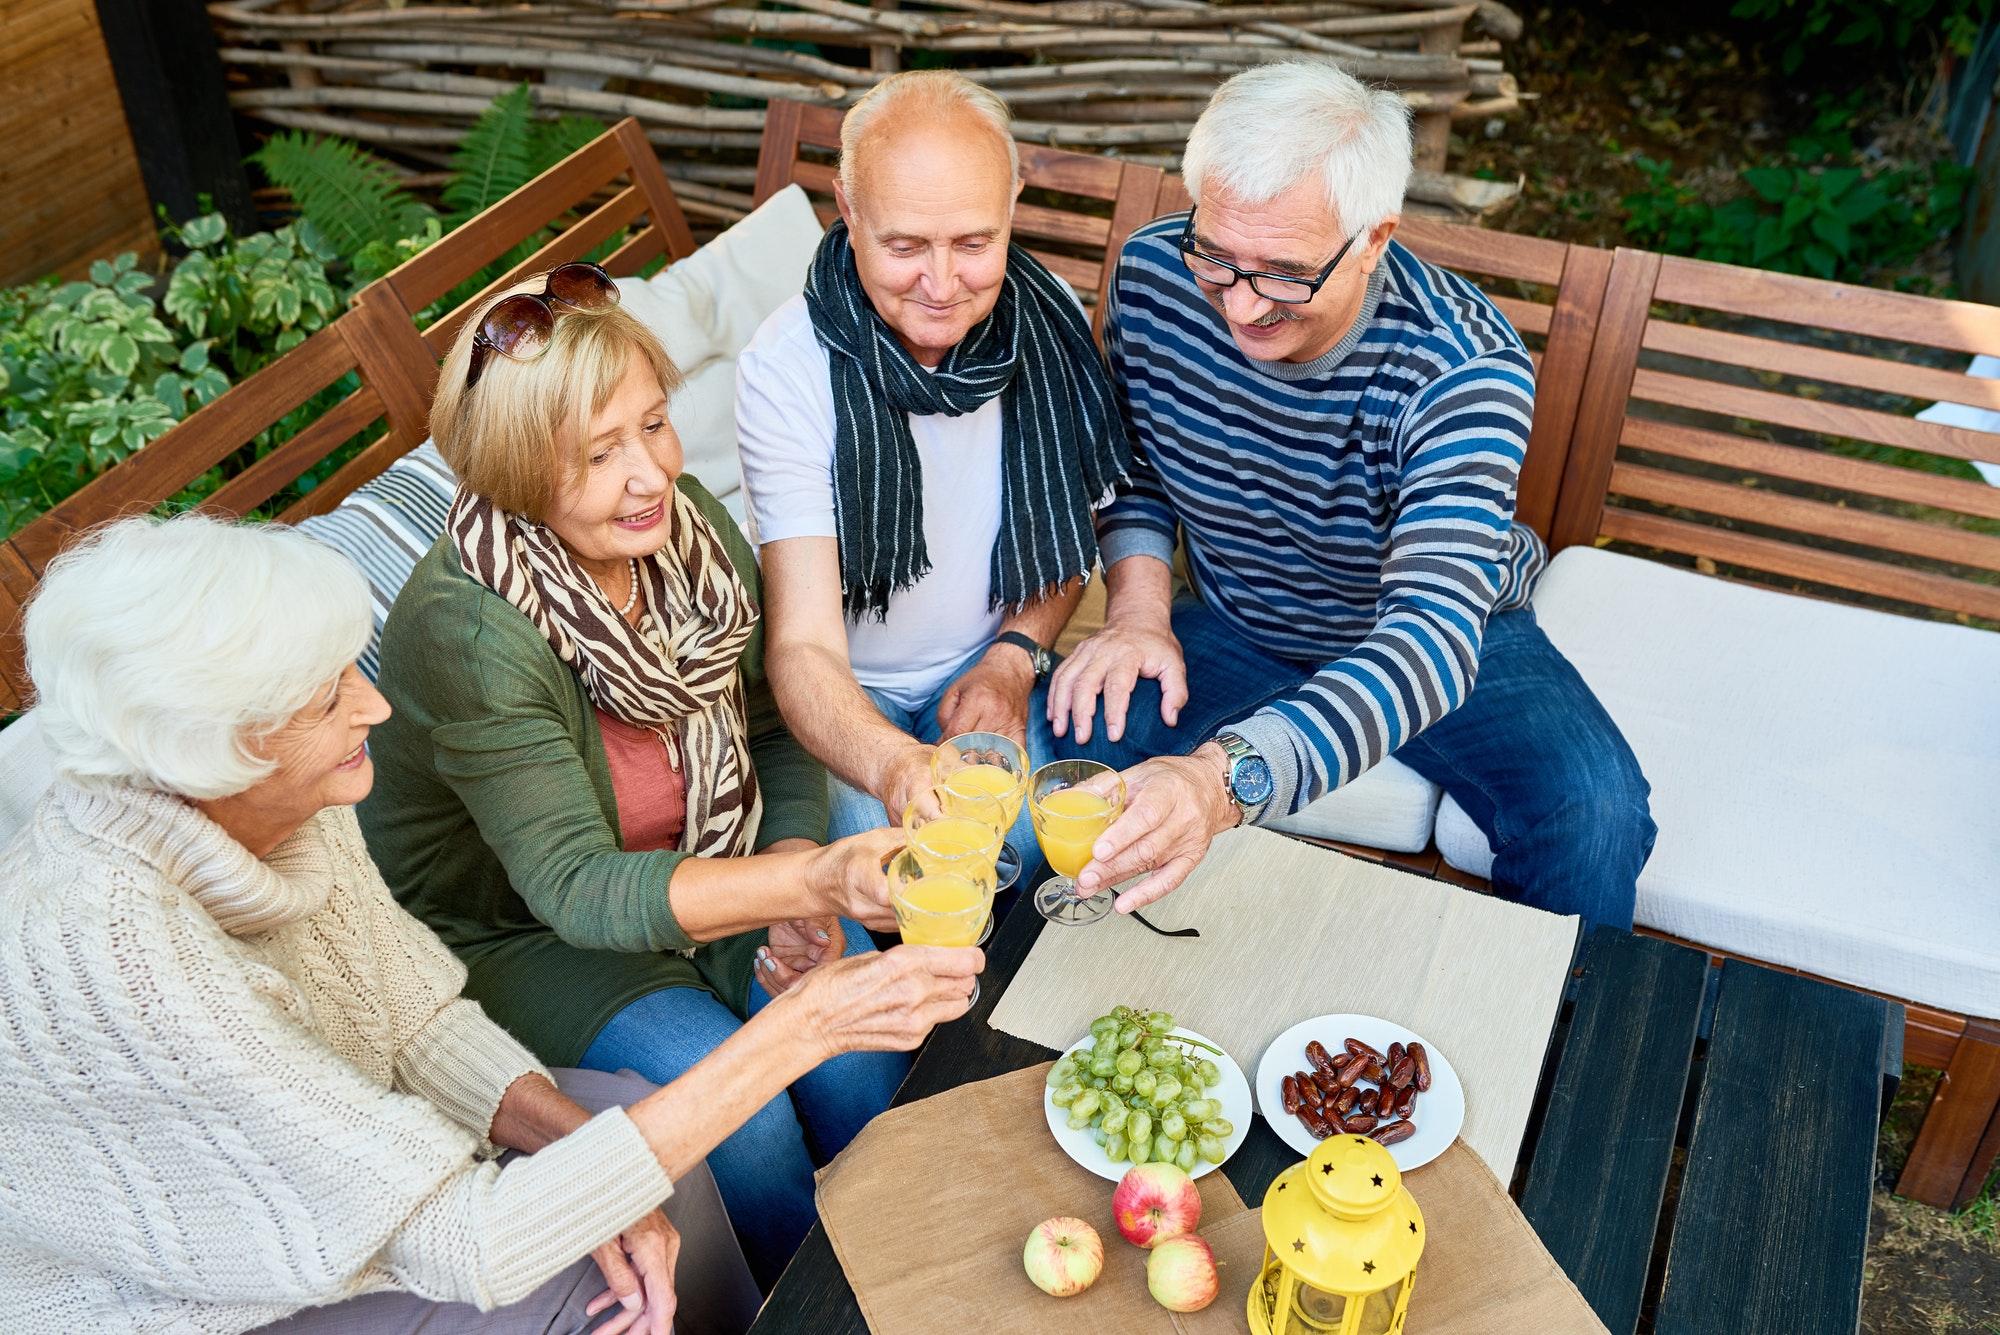 Friends Meeting in Retirement